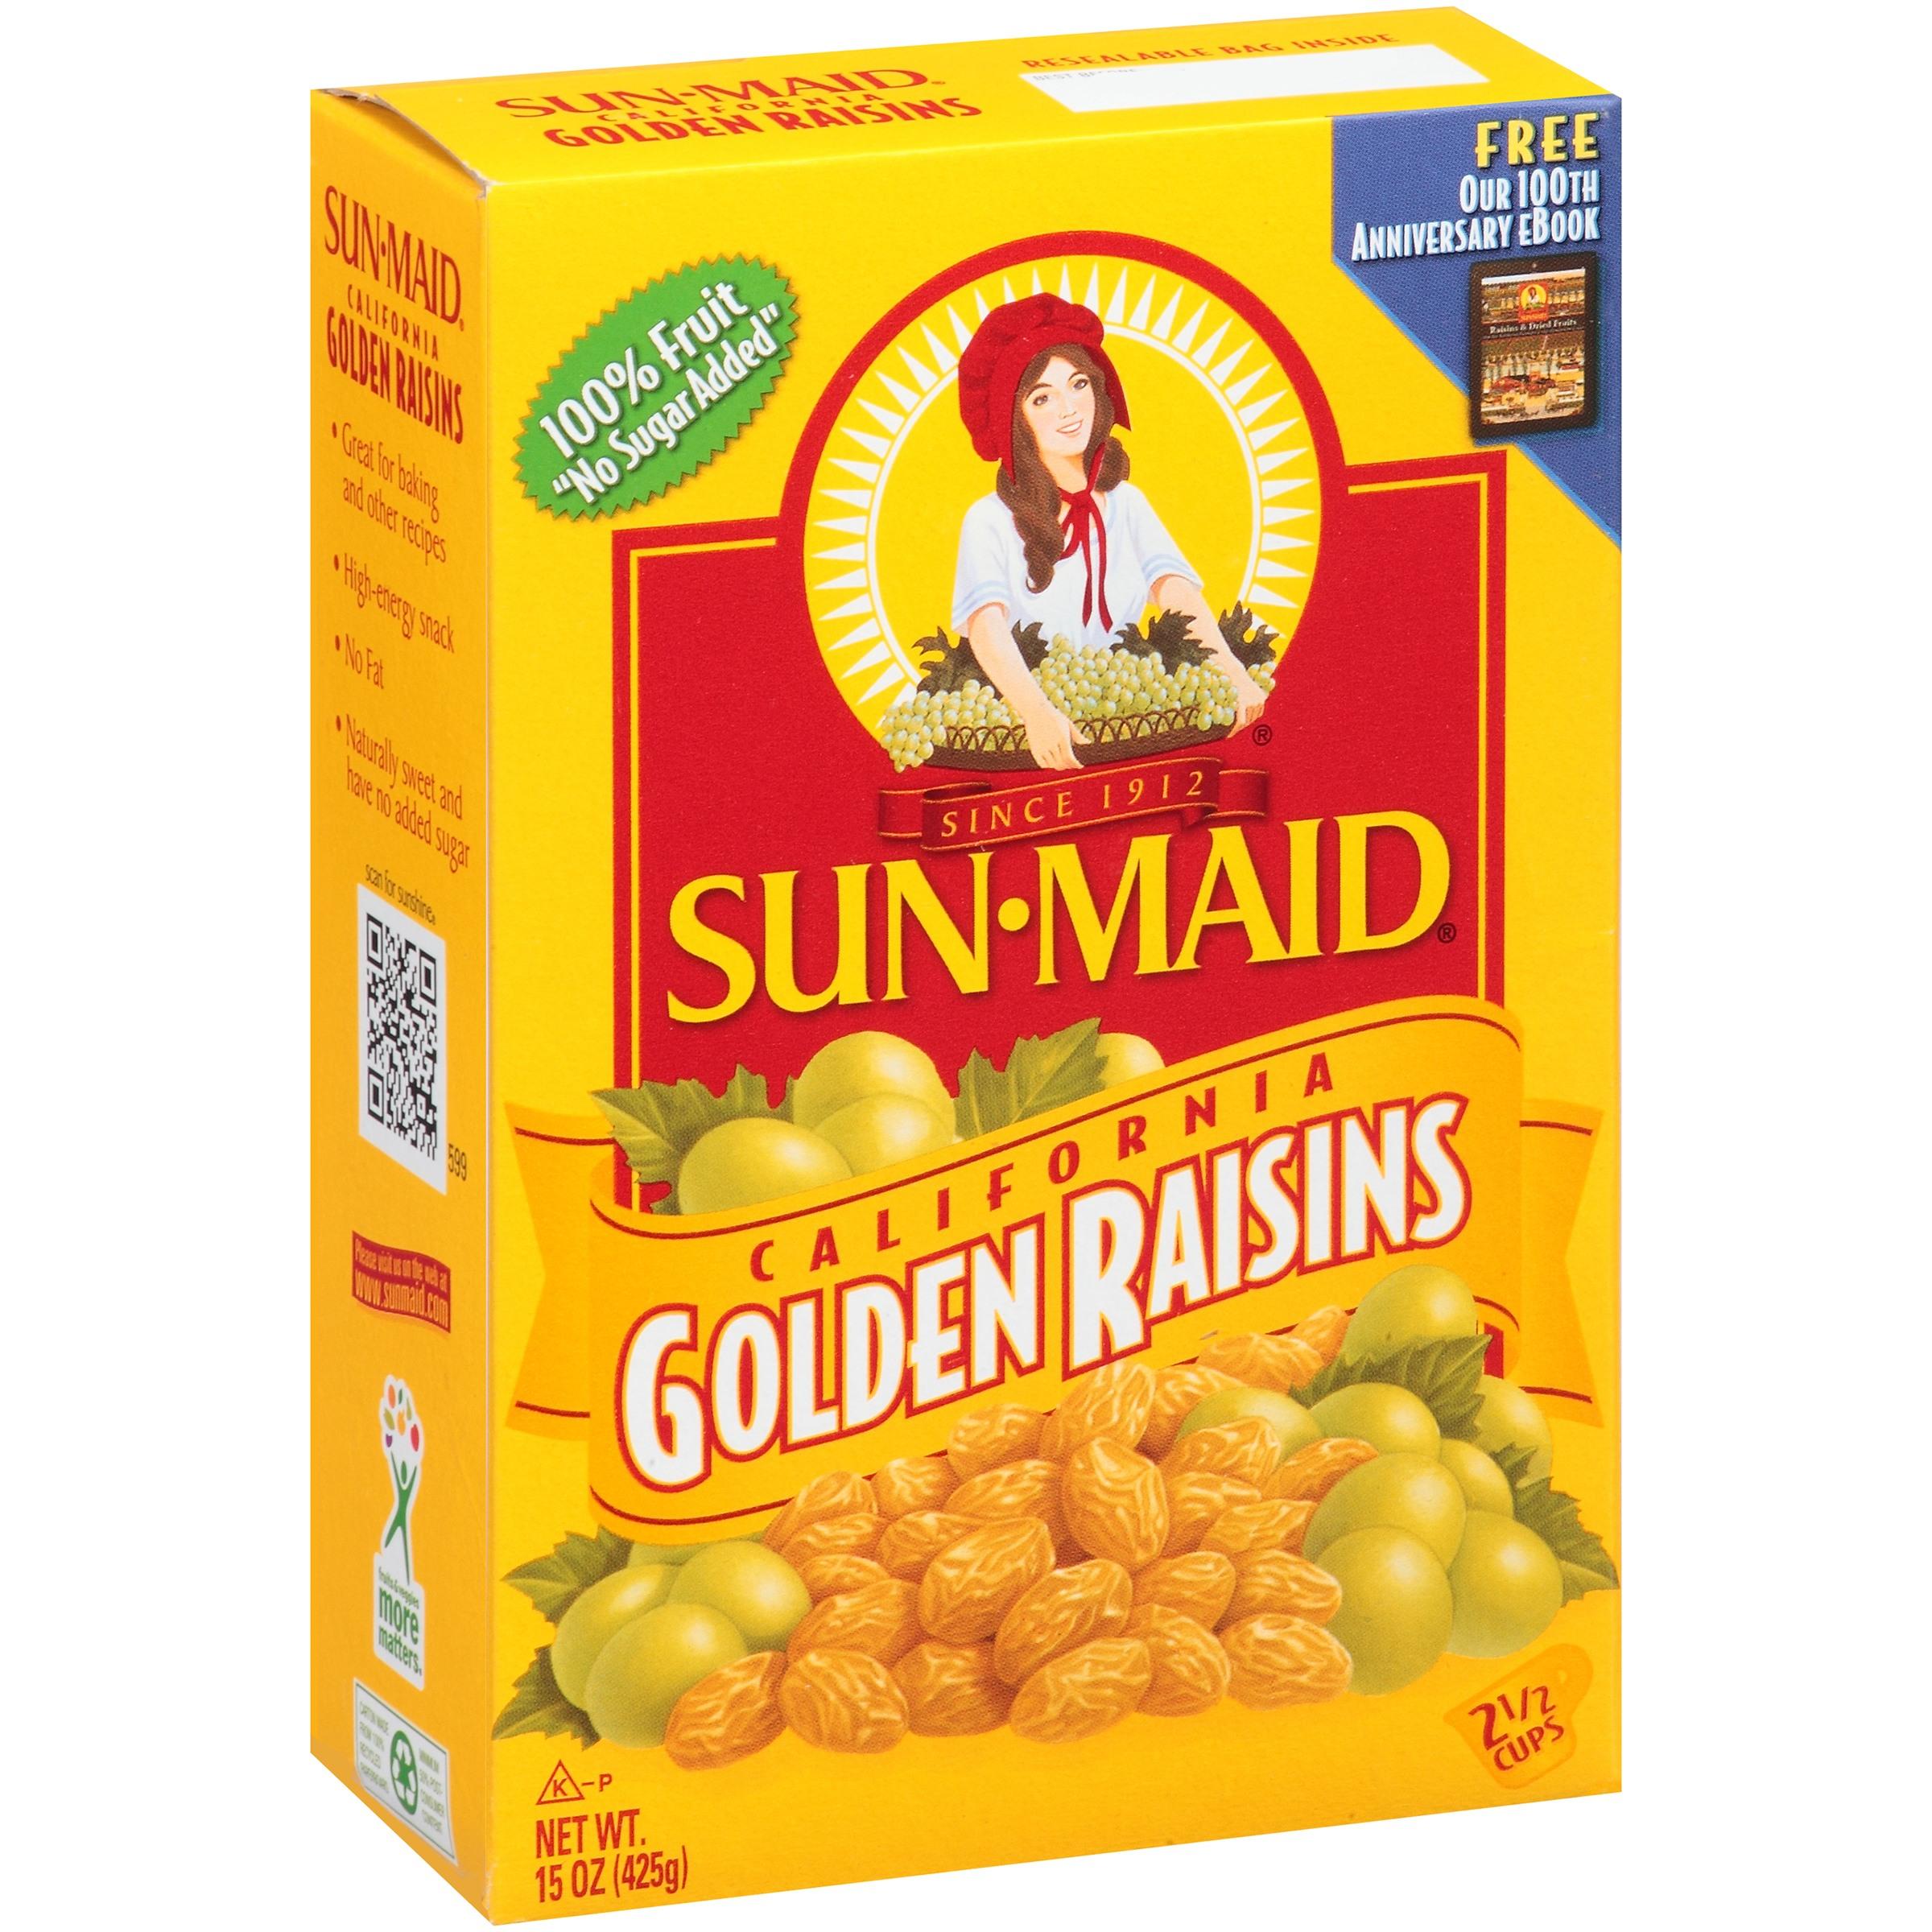 Sun-Maid California Golden Raisins, 15.0 Oz